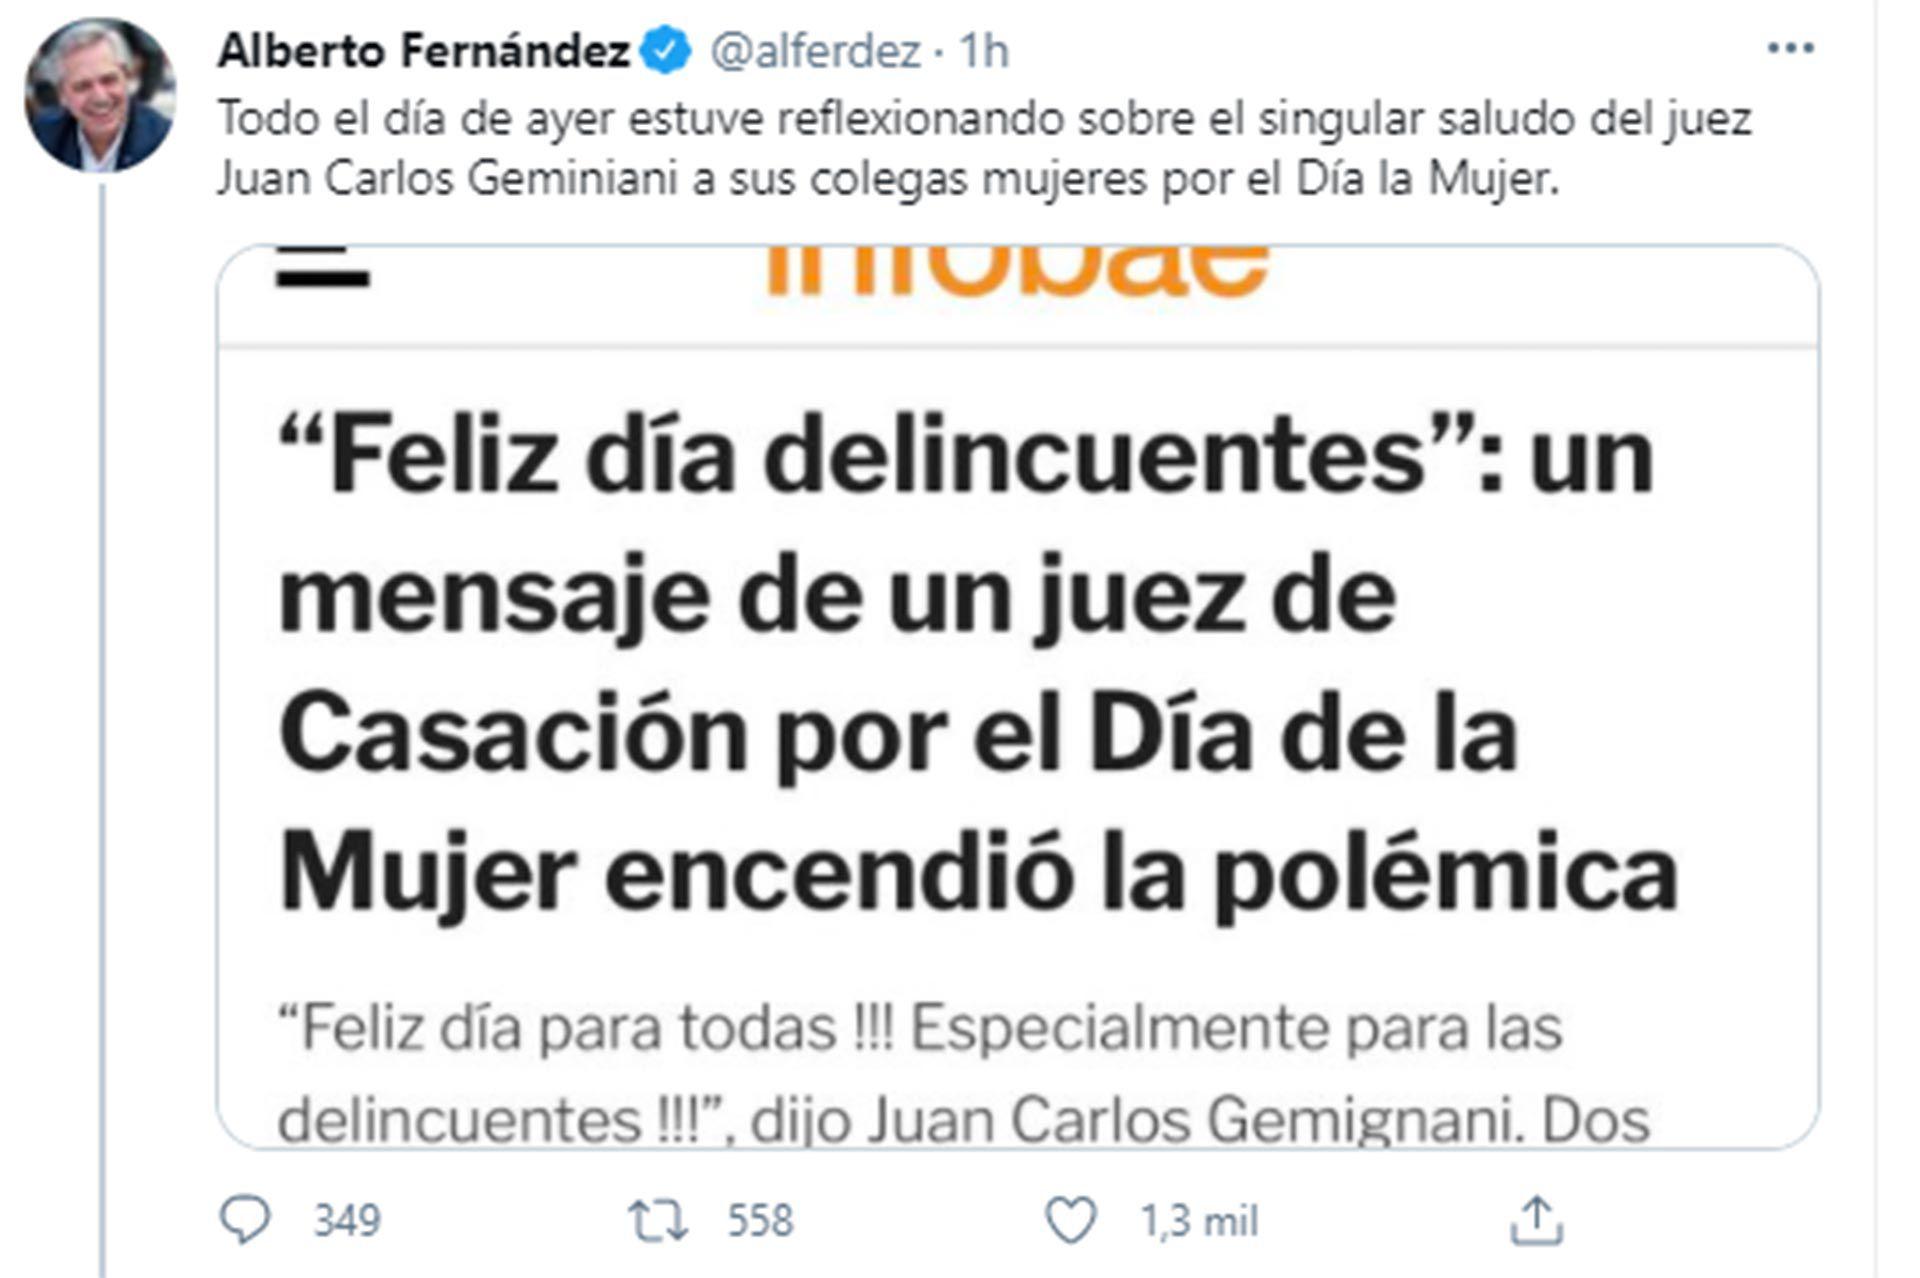 Alberto Fernández sobre juez geminani